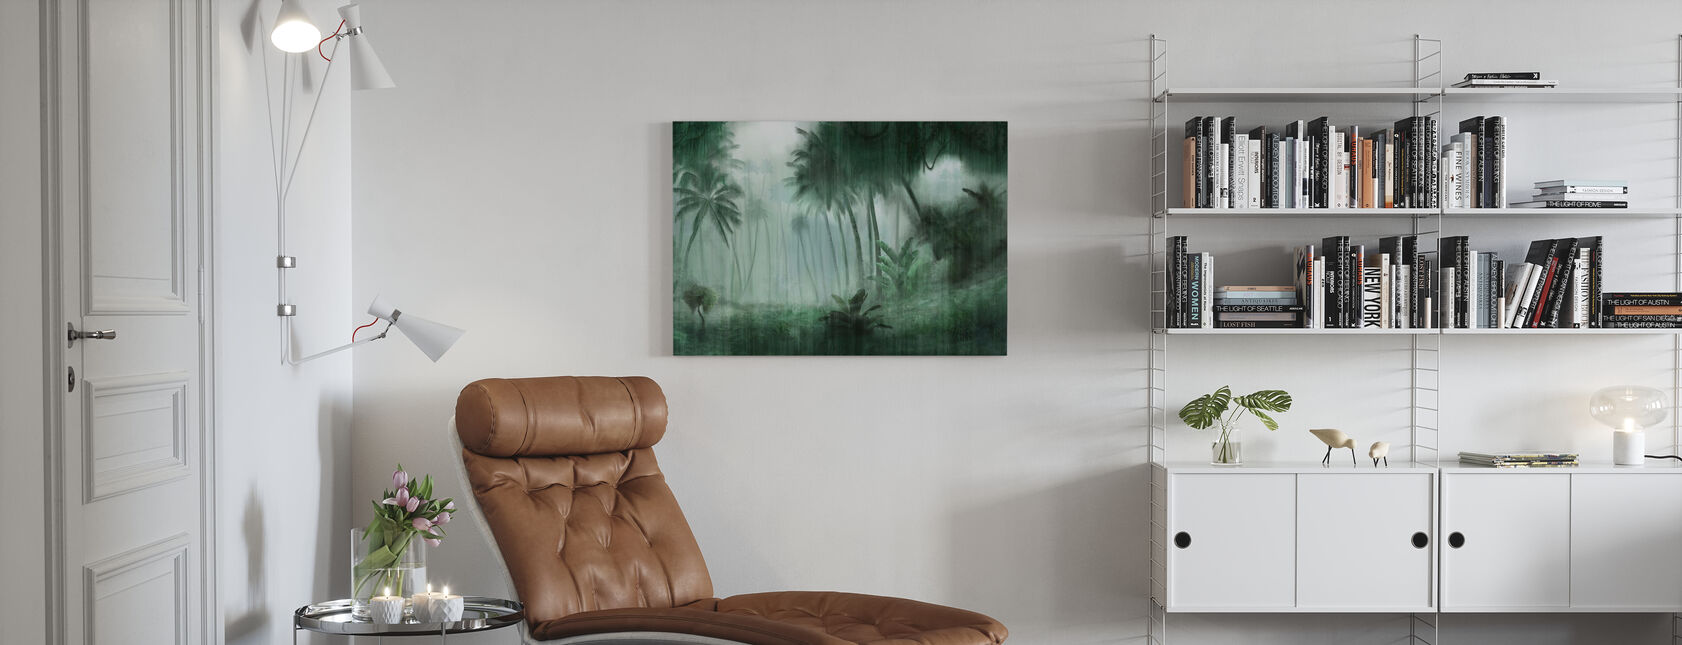 Definitive Tropical - Canvas print - Living Room